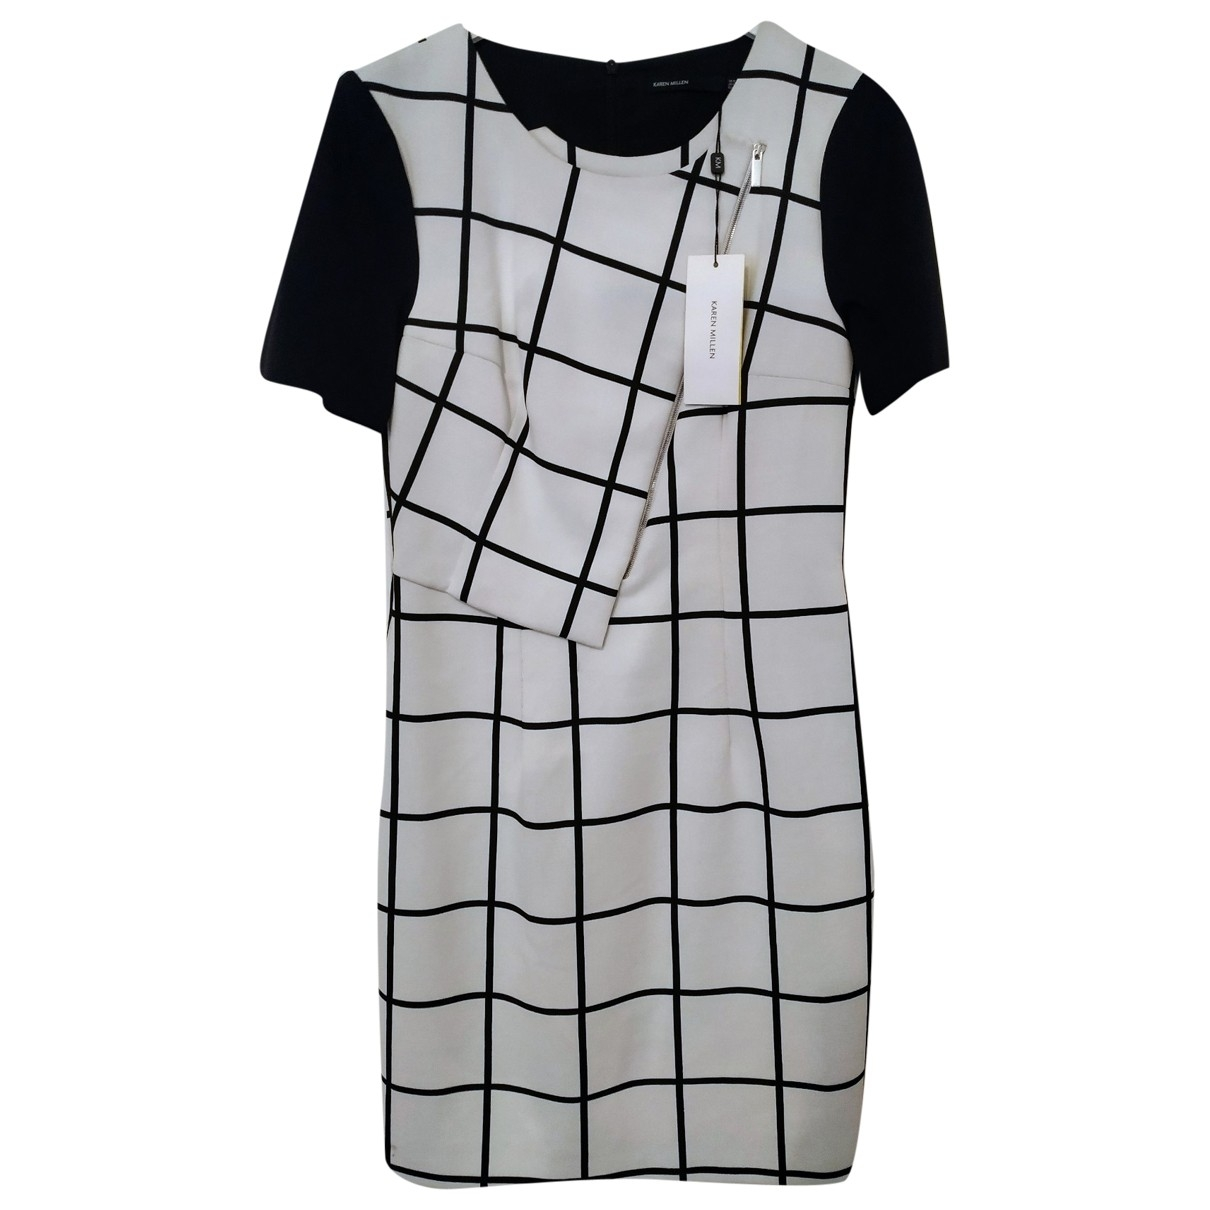 Karen Millen \N Kleid in  Weiss Baumwolle - Elasthan